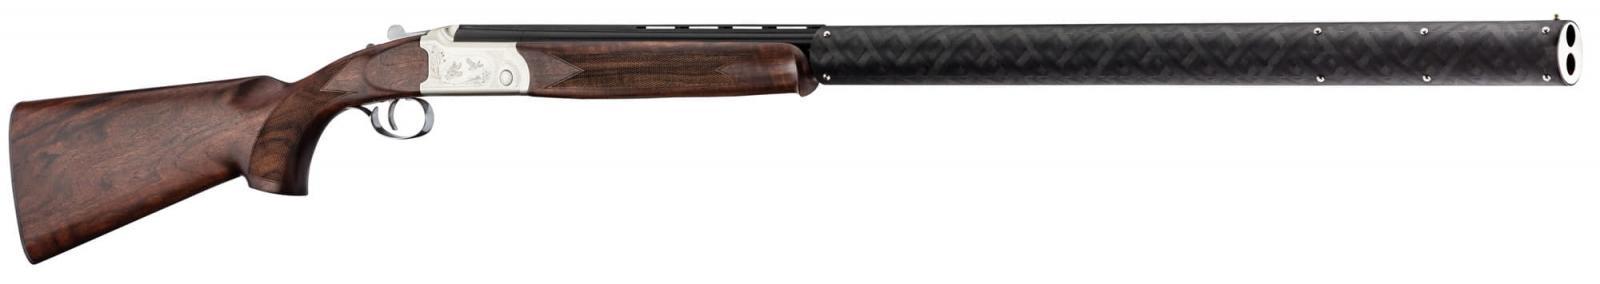 Fusil Superposé YILDIZ MC140S Cal. 410.76